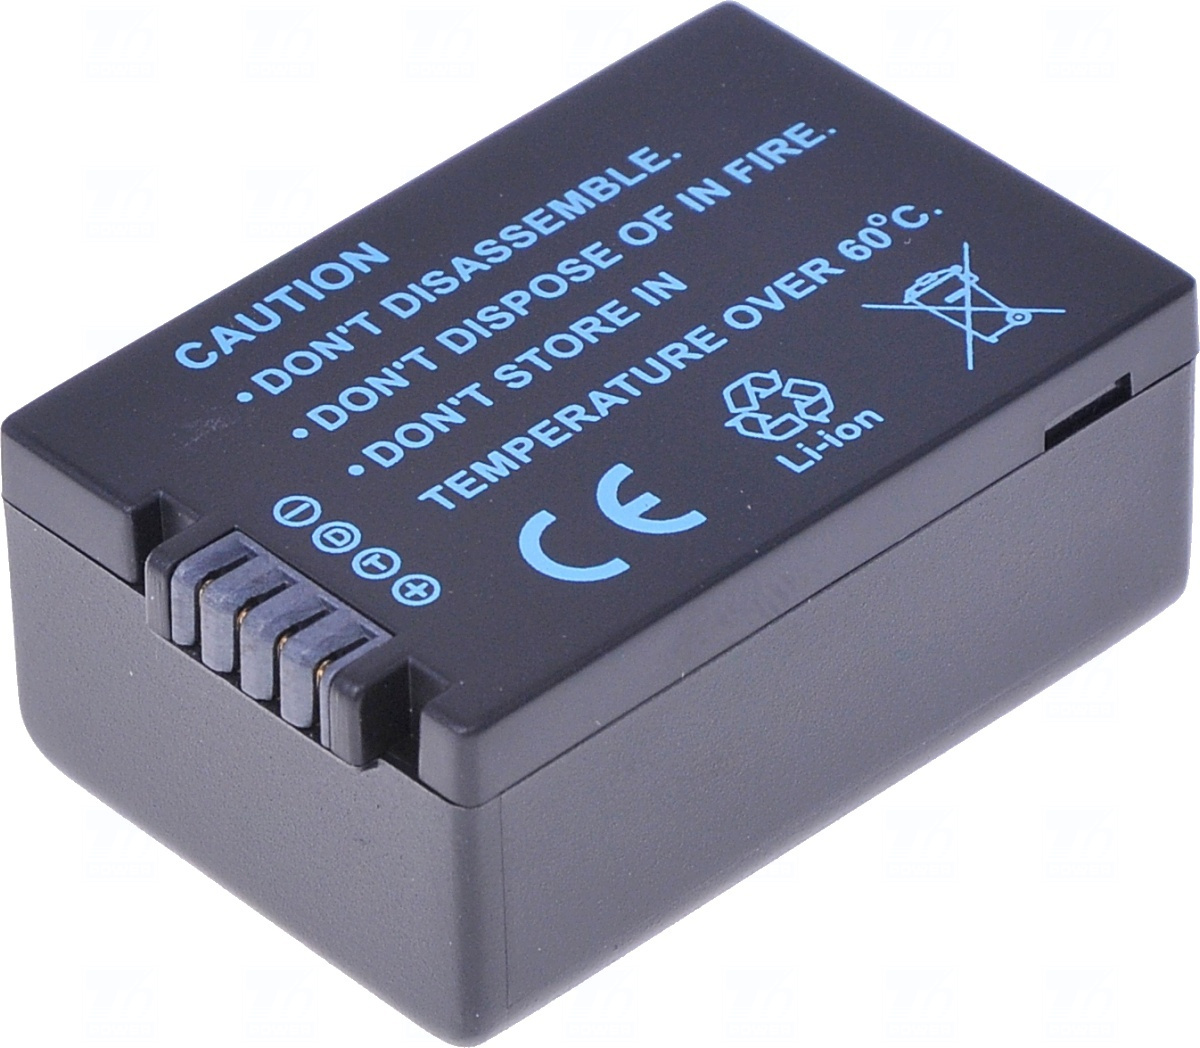 Baterie T6 power DMW-BMB9E, DMW-BMB9GK, DMW-BMB9, BP-DC9, BP-DC9-E